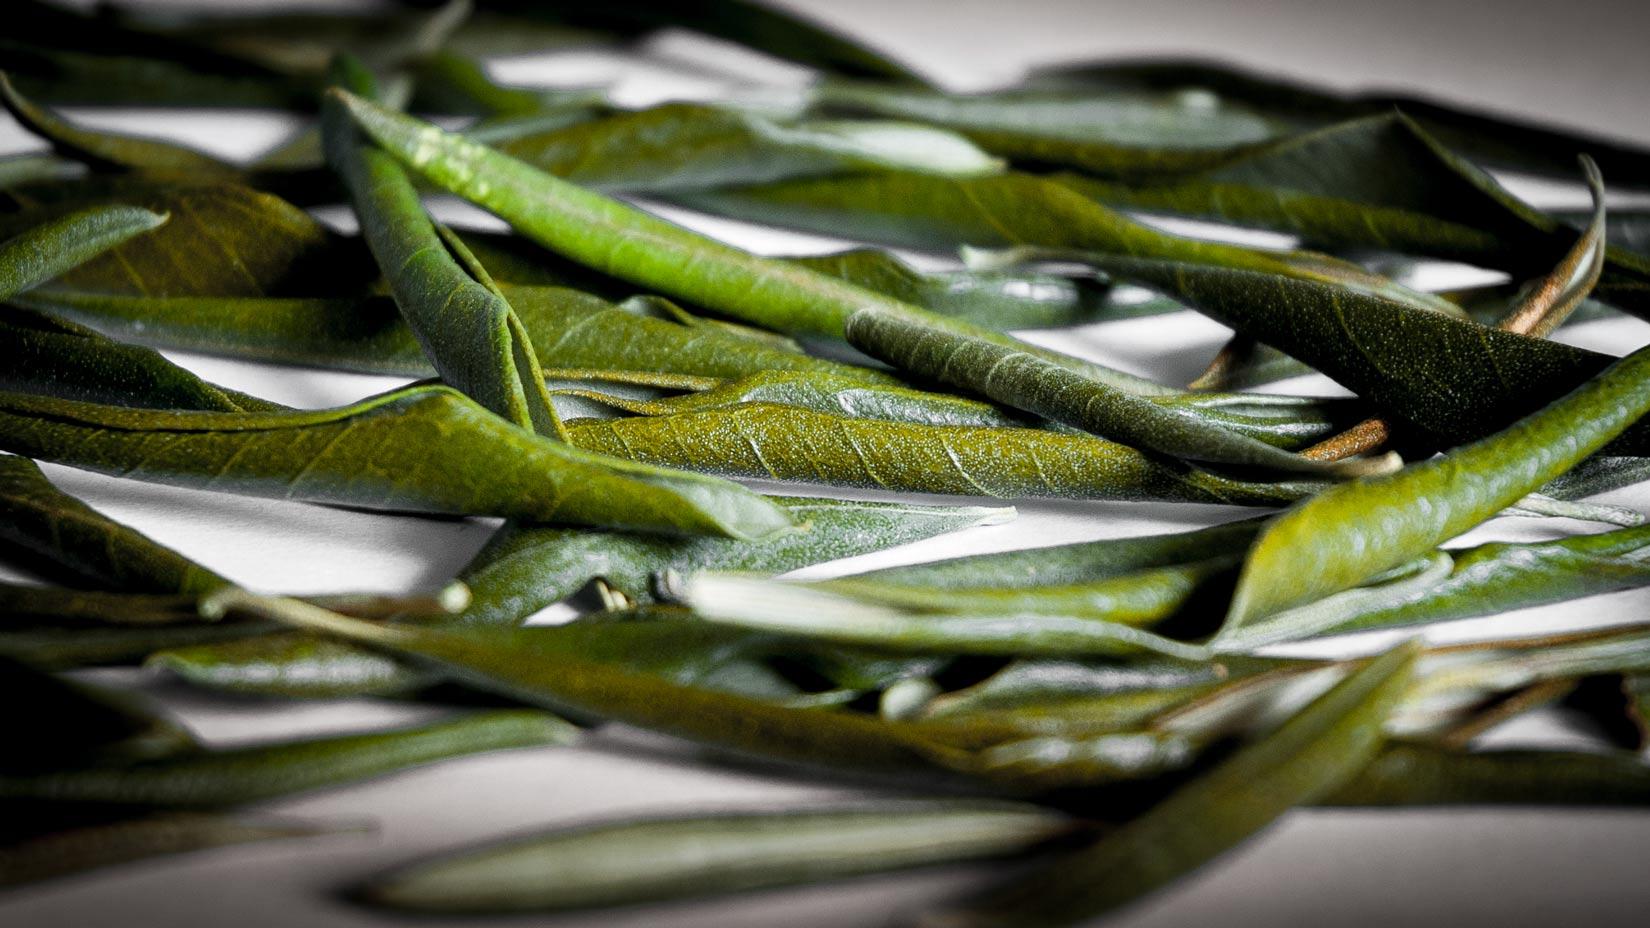 Usušený olivový list uchovávejte v temnu a suchu